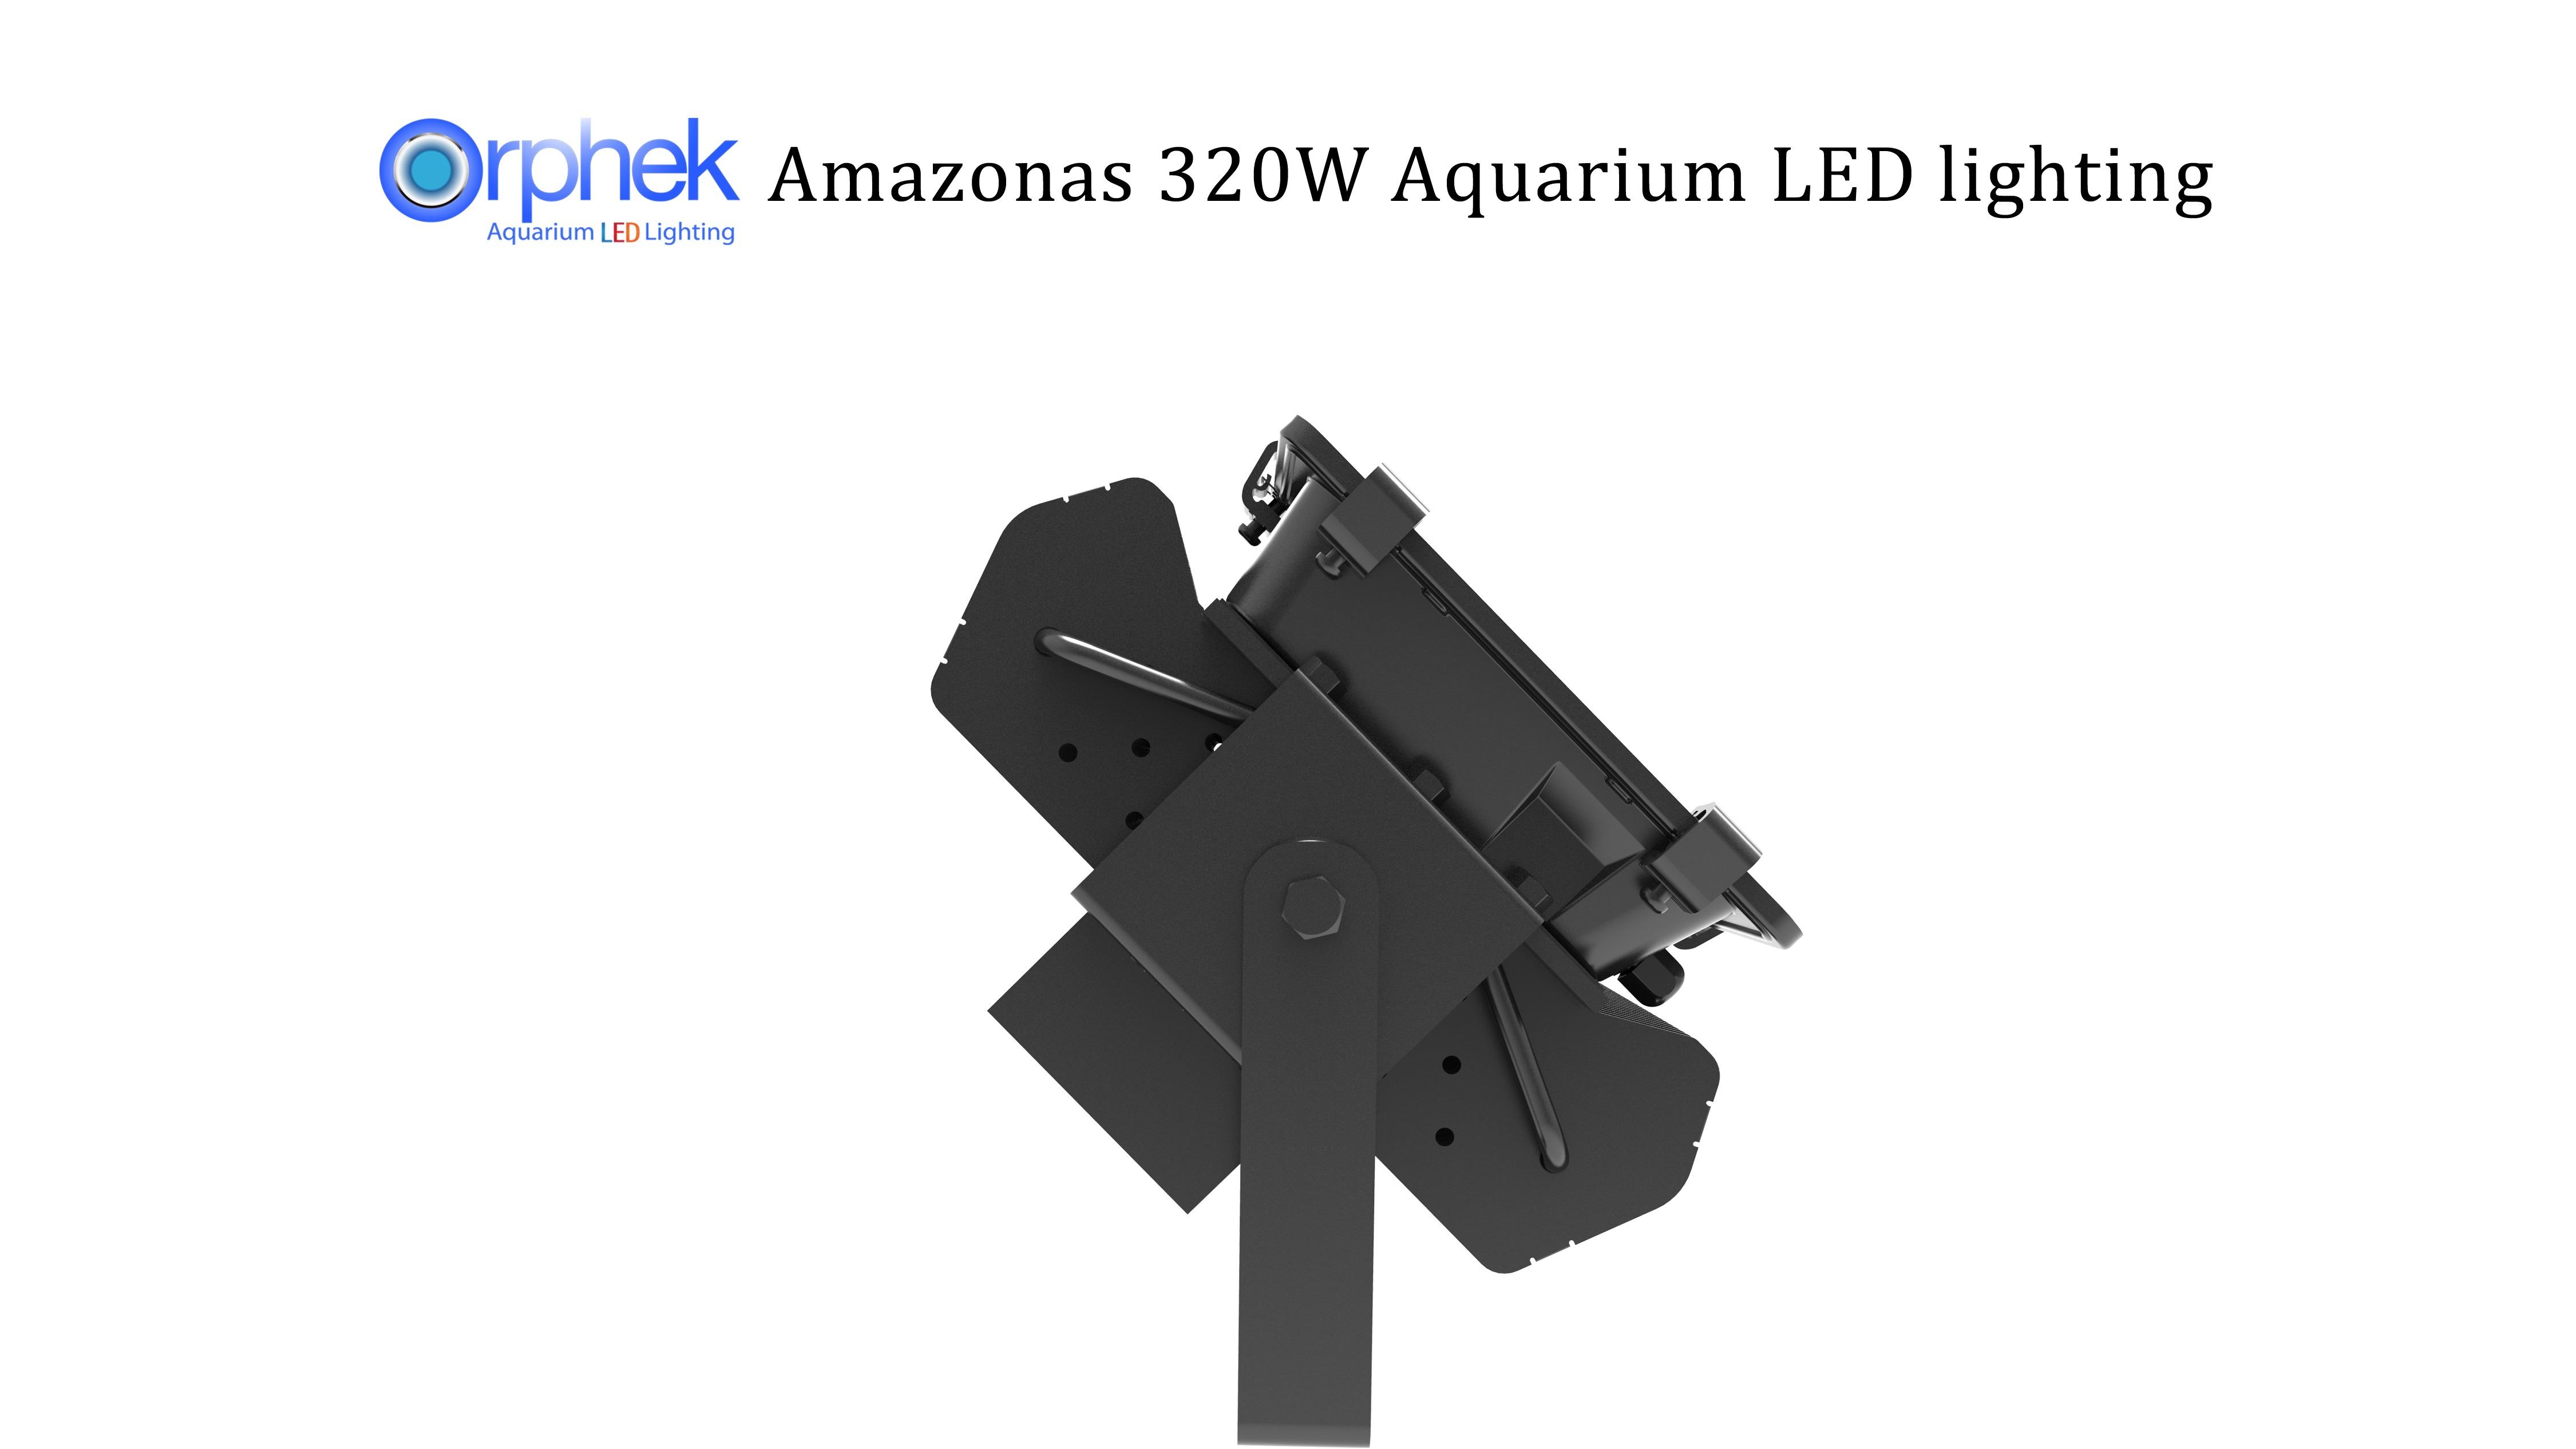 Orphek-Amazonas 320w-LED-lightis-akuarium